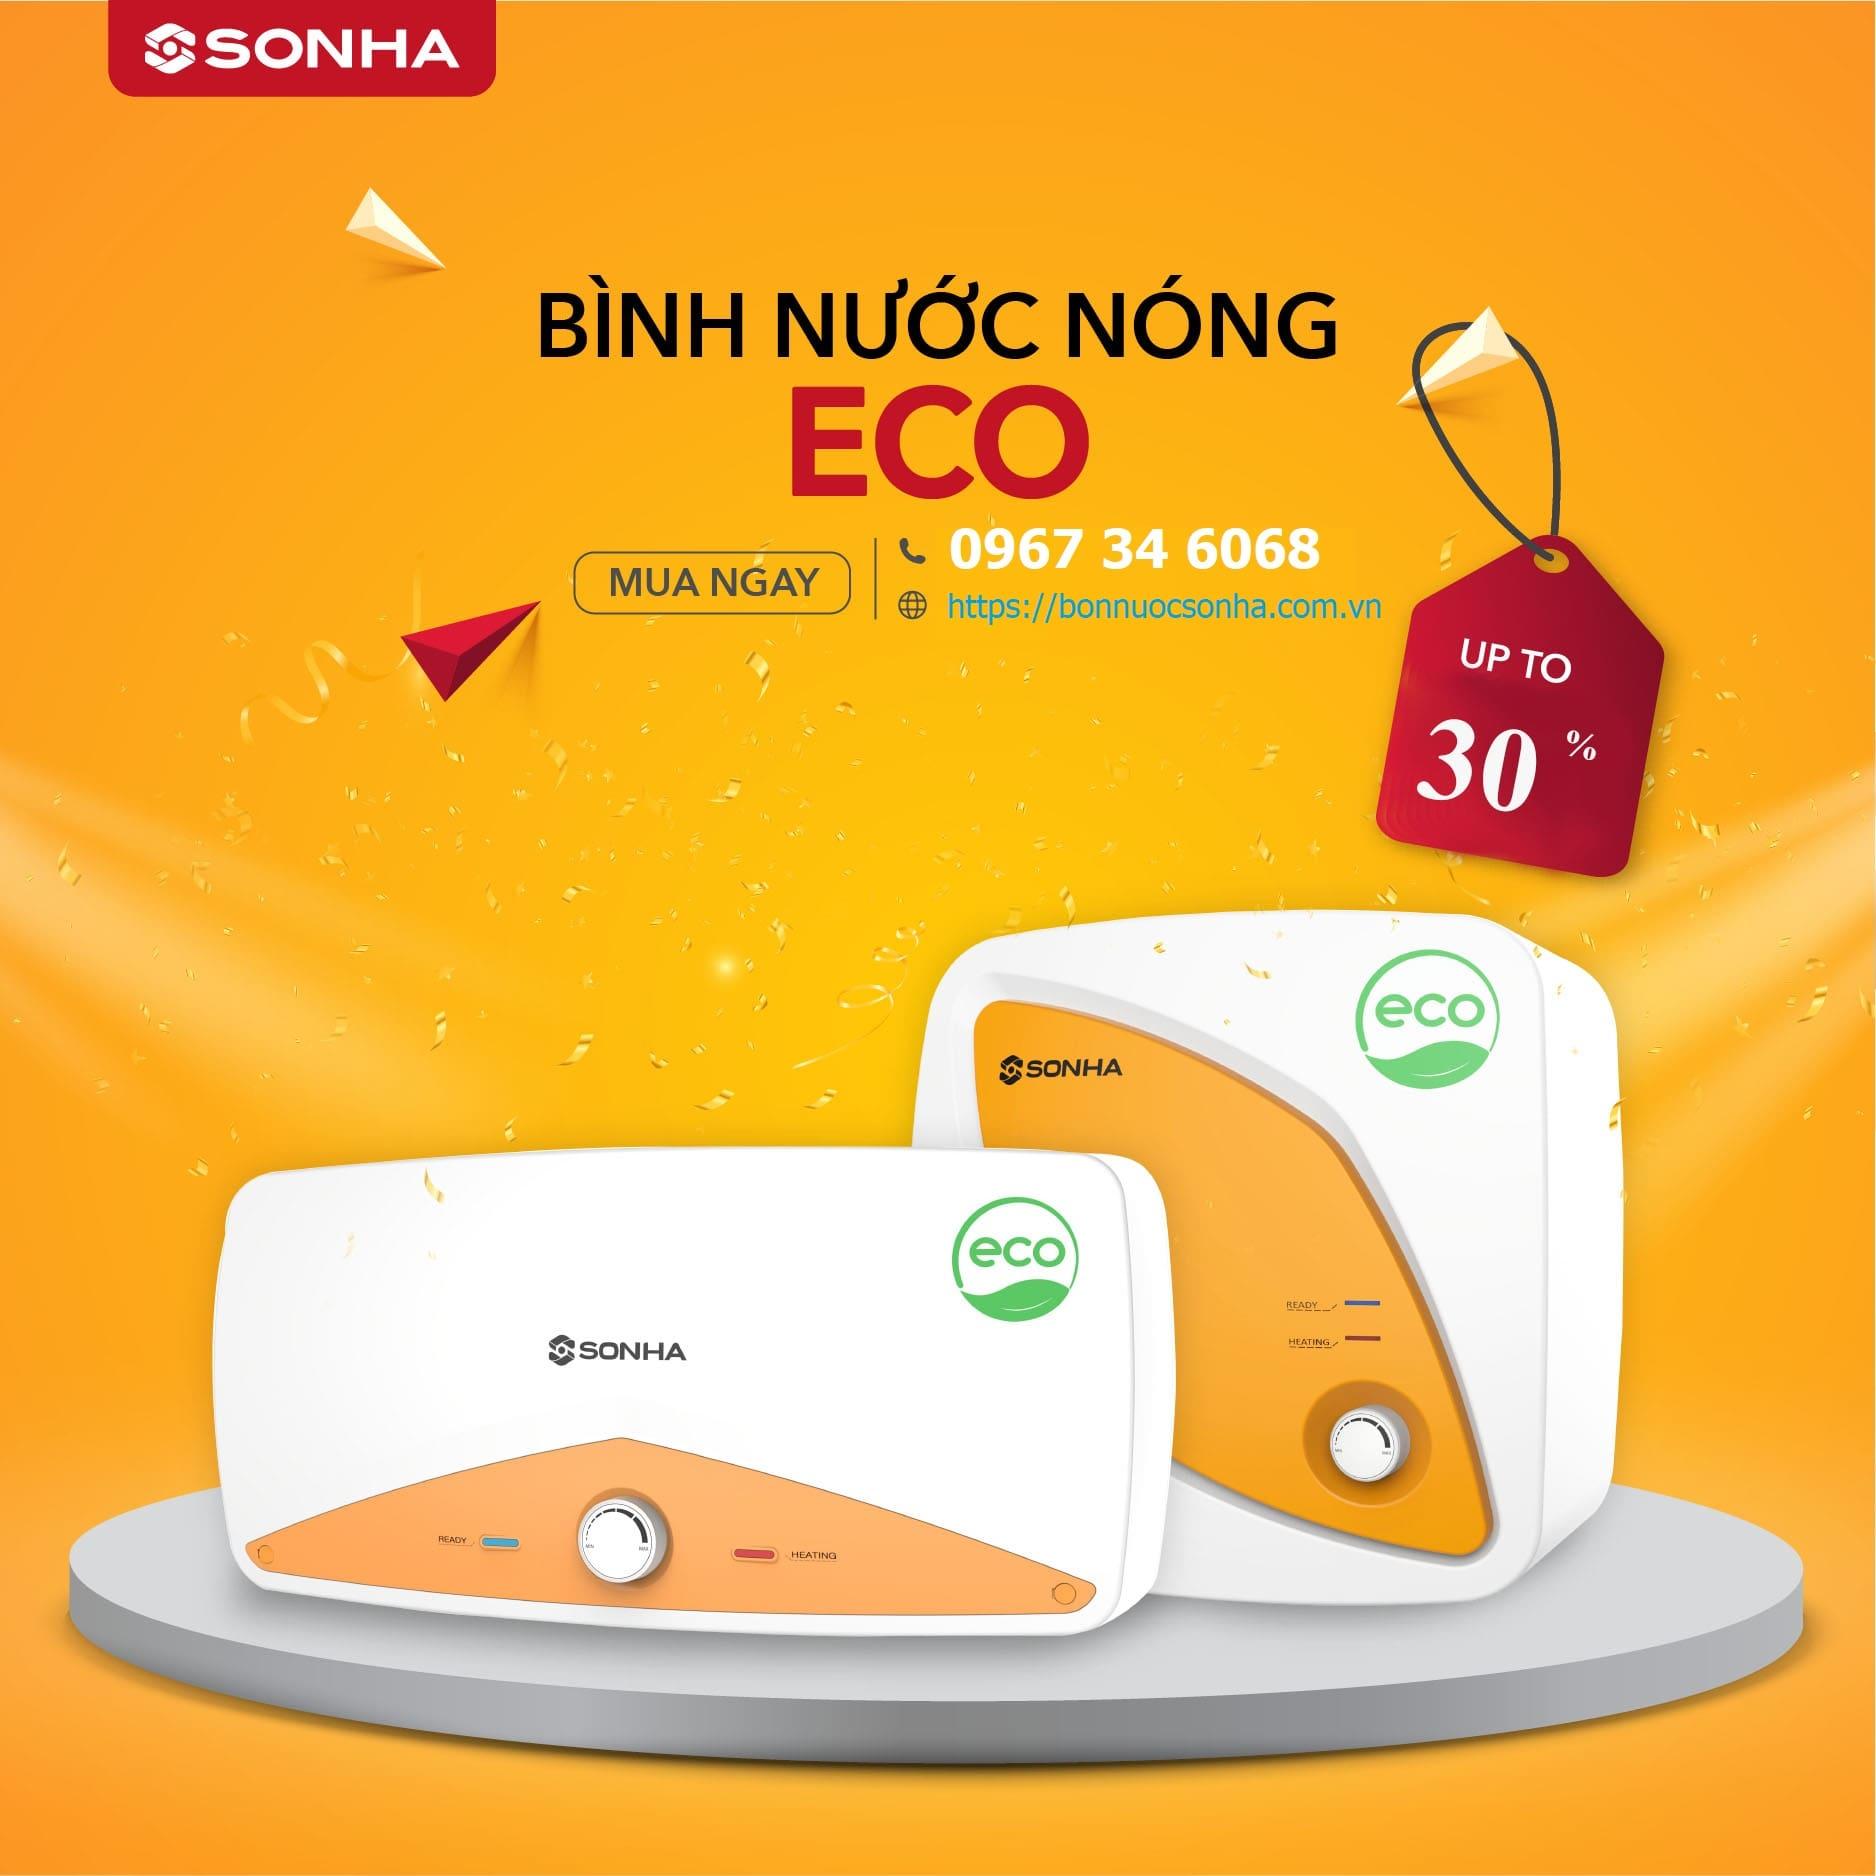 Khuyen Mai Binh Nuoc Nong Son Ha Eco Min